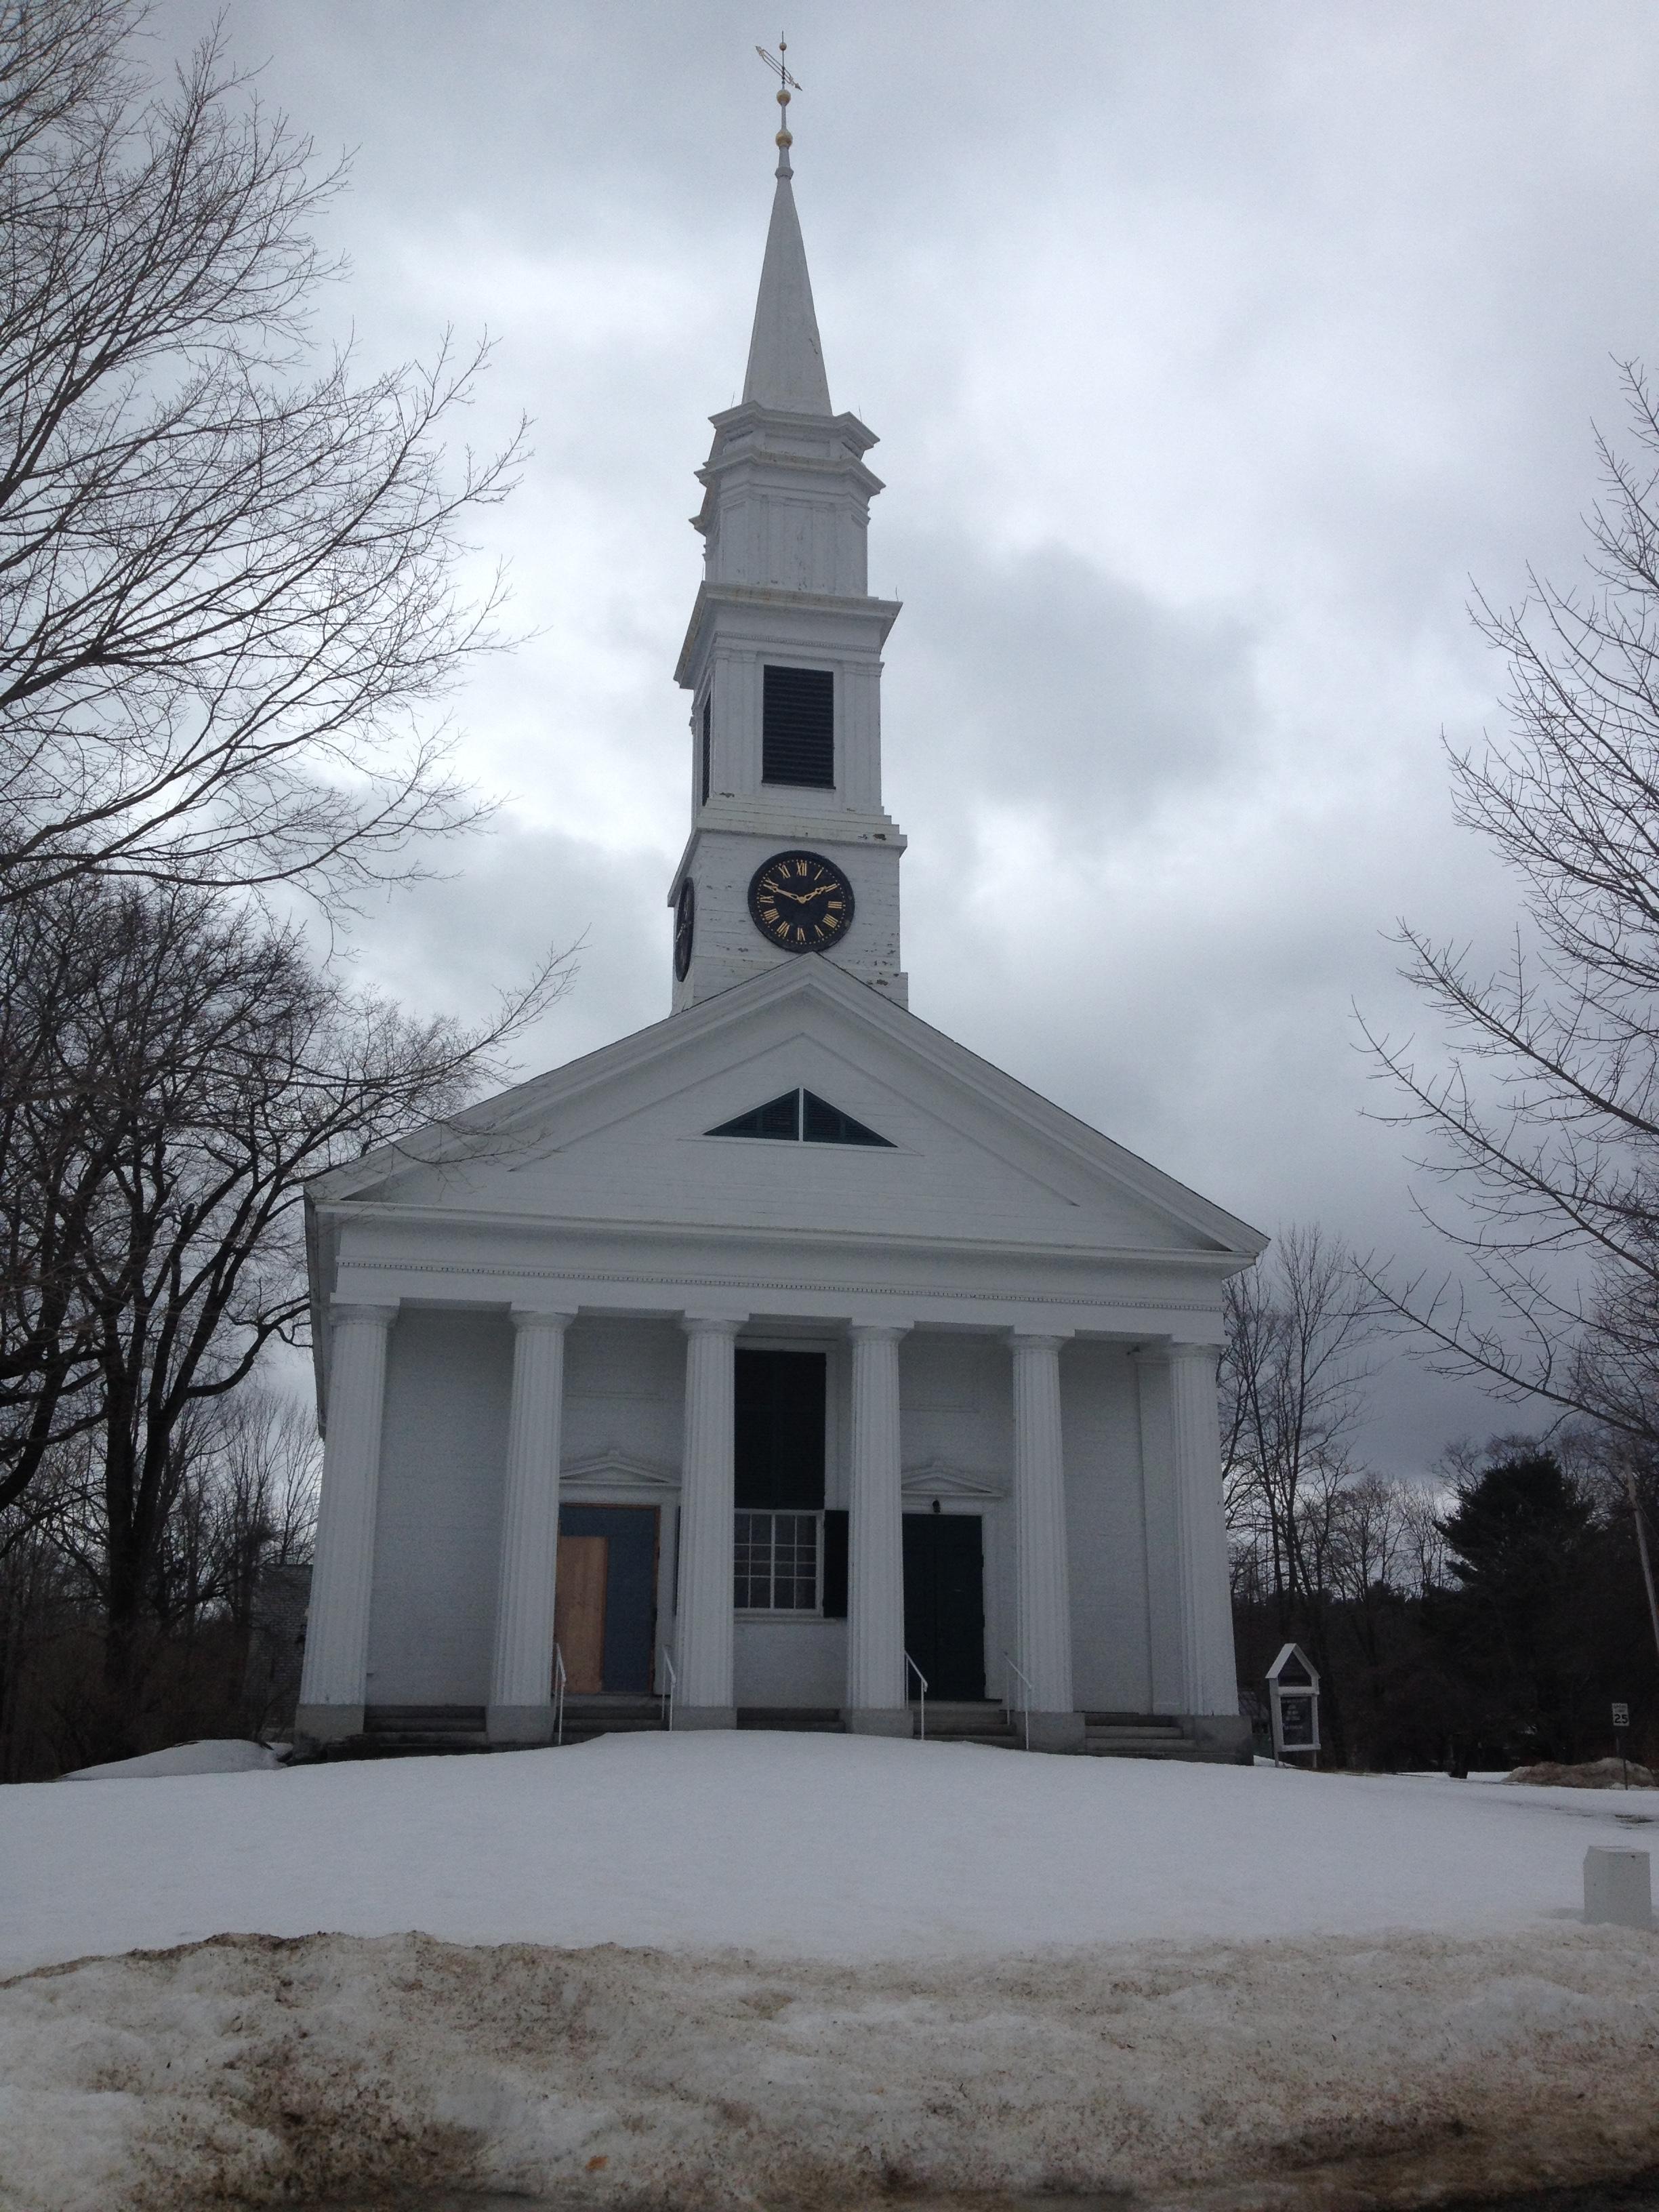 New England Churches - Rev. Peter M Preble | Rev. Peter M Preble